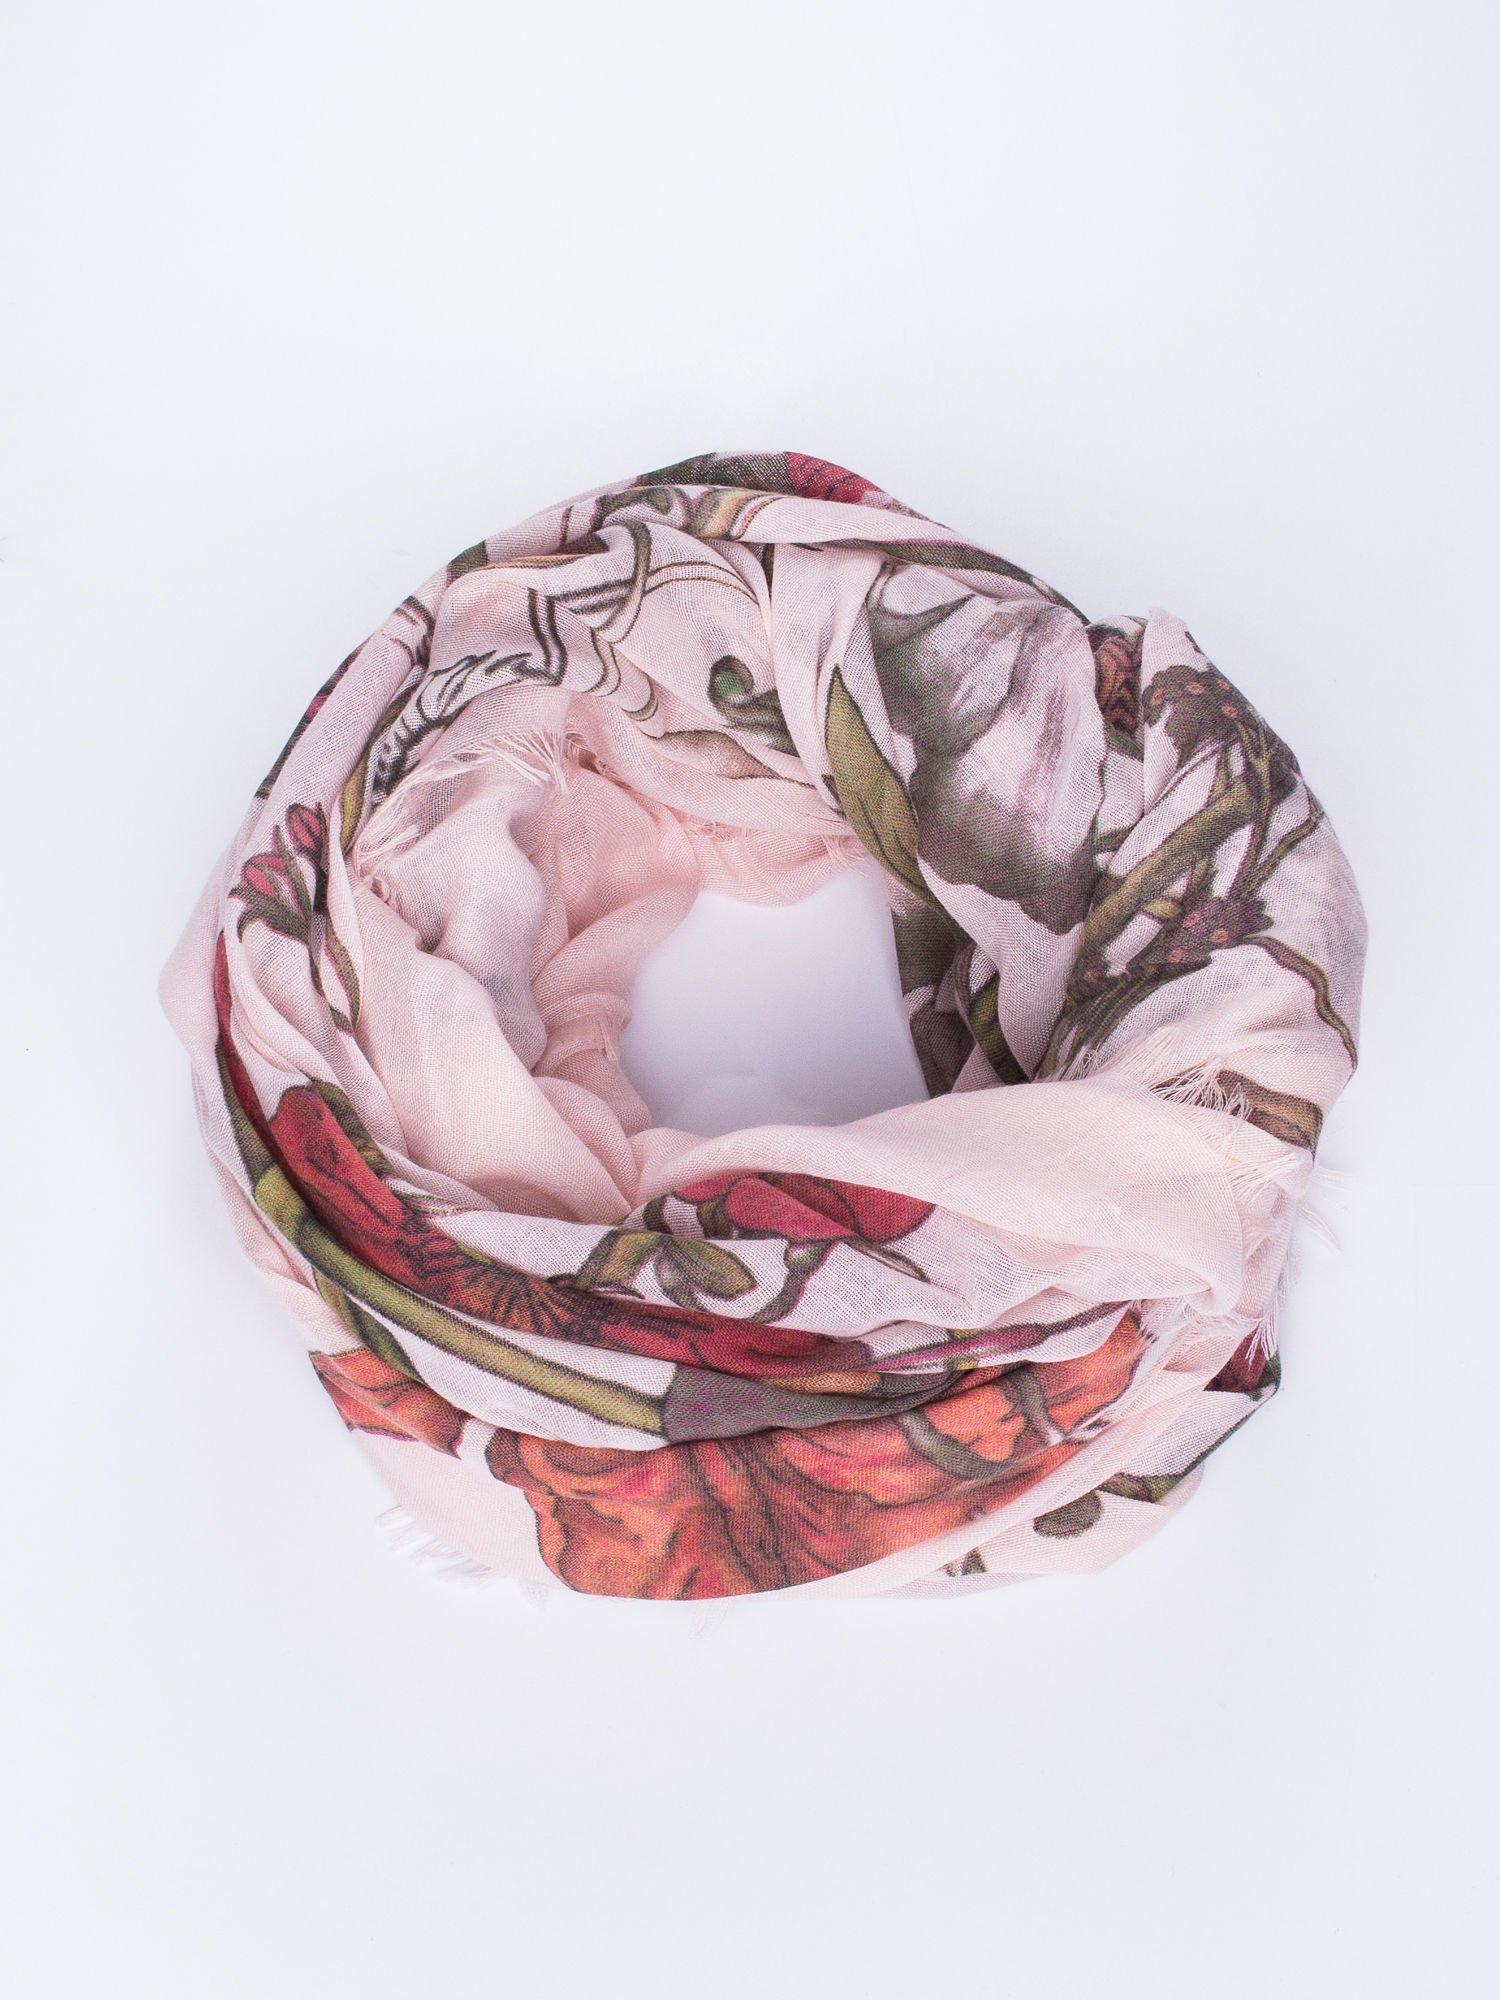 Jasnoróżowa chusta damska w roślinny ornament                                  zdj.                                  1